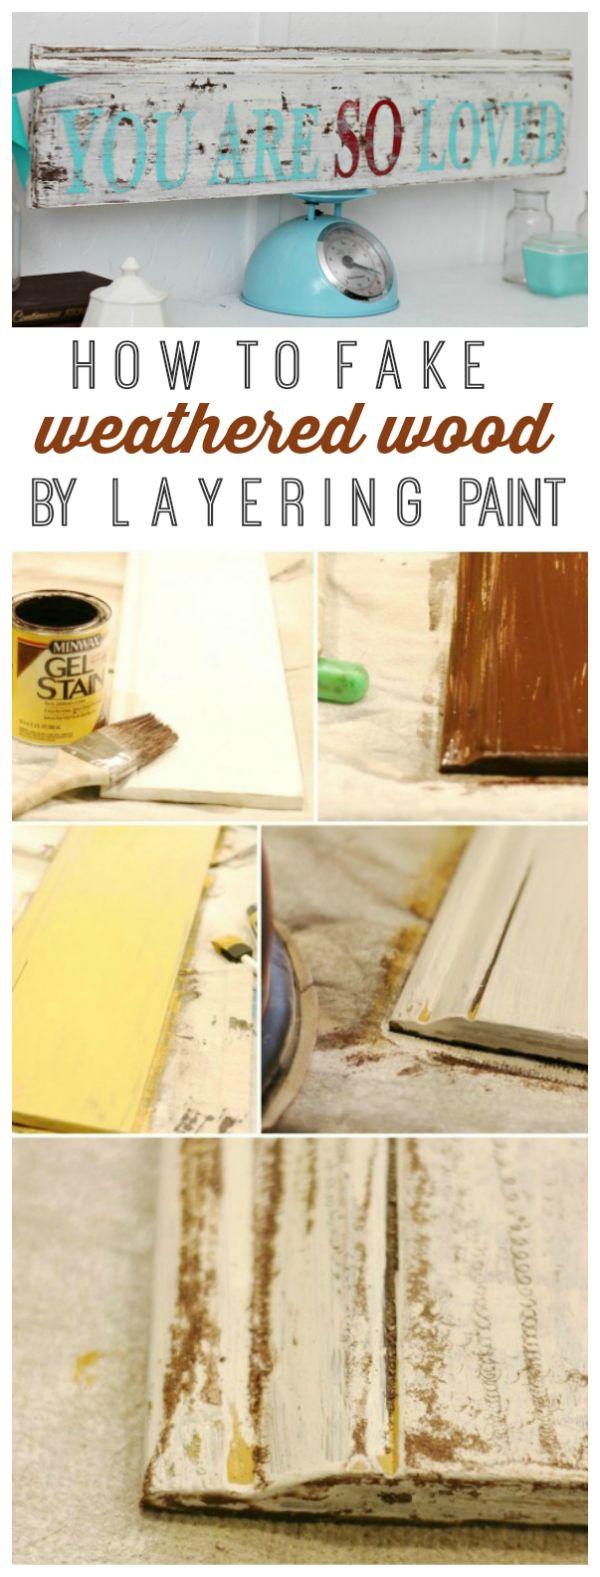 Wood Stain Painting Techniques 43 Best Painting Techniques Images On Pinterest Paint Furniture